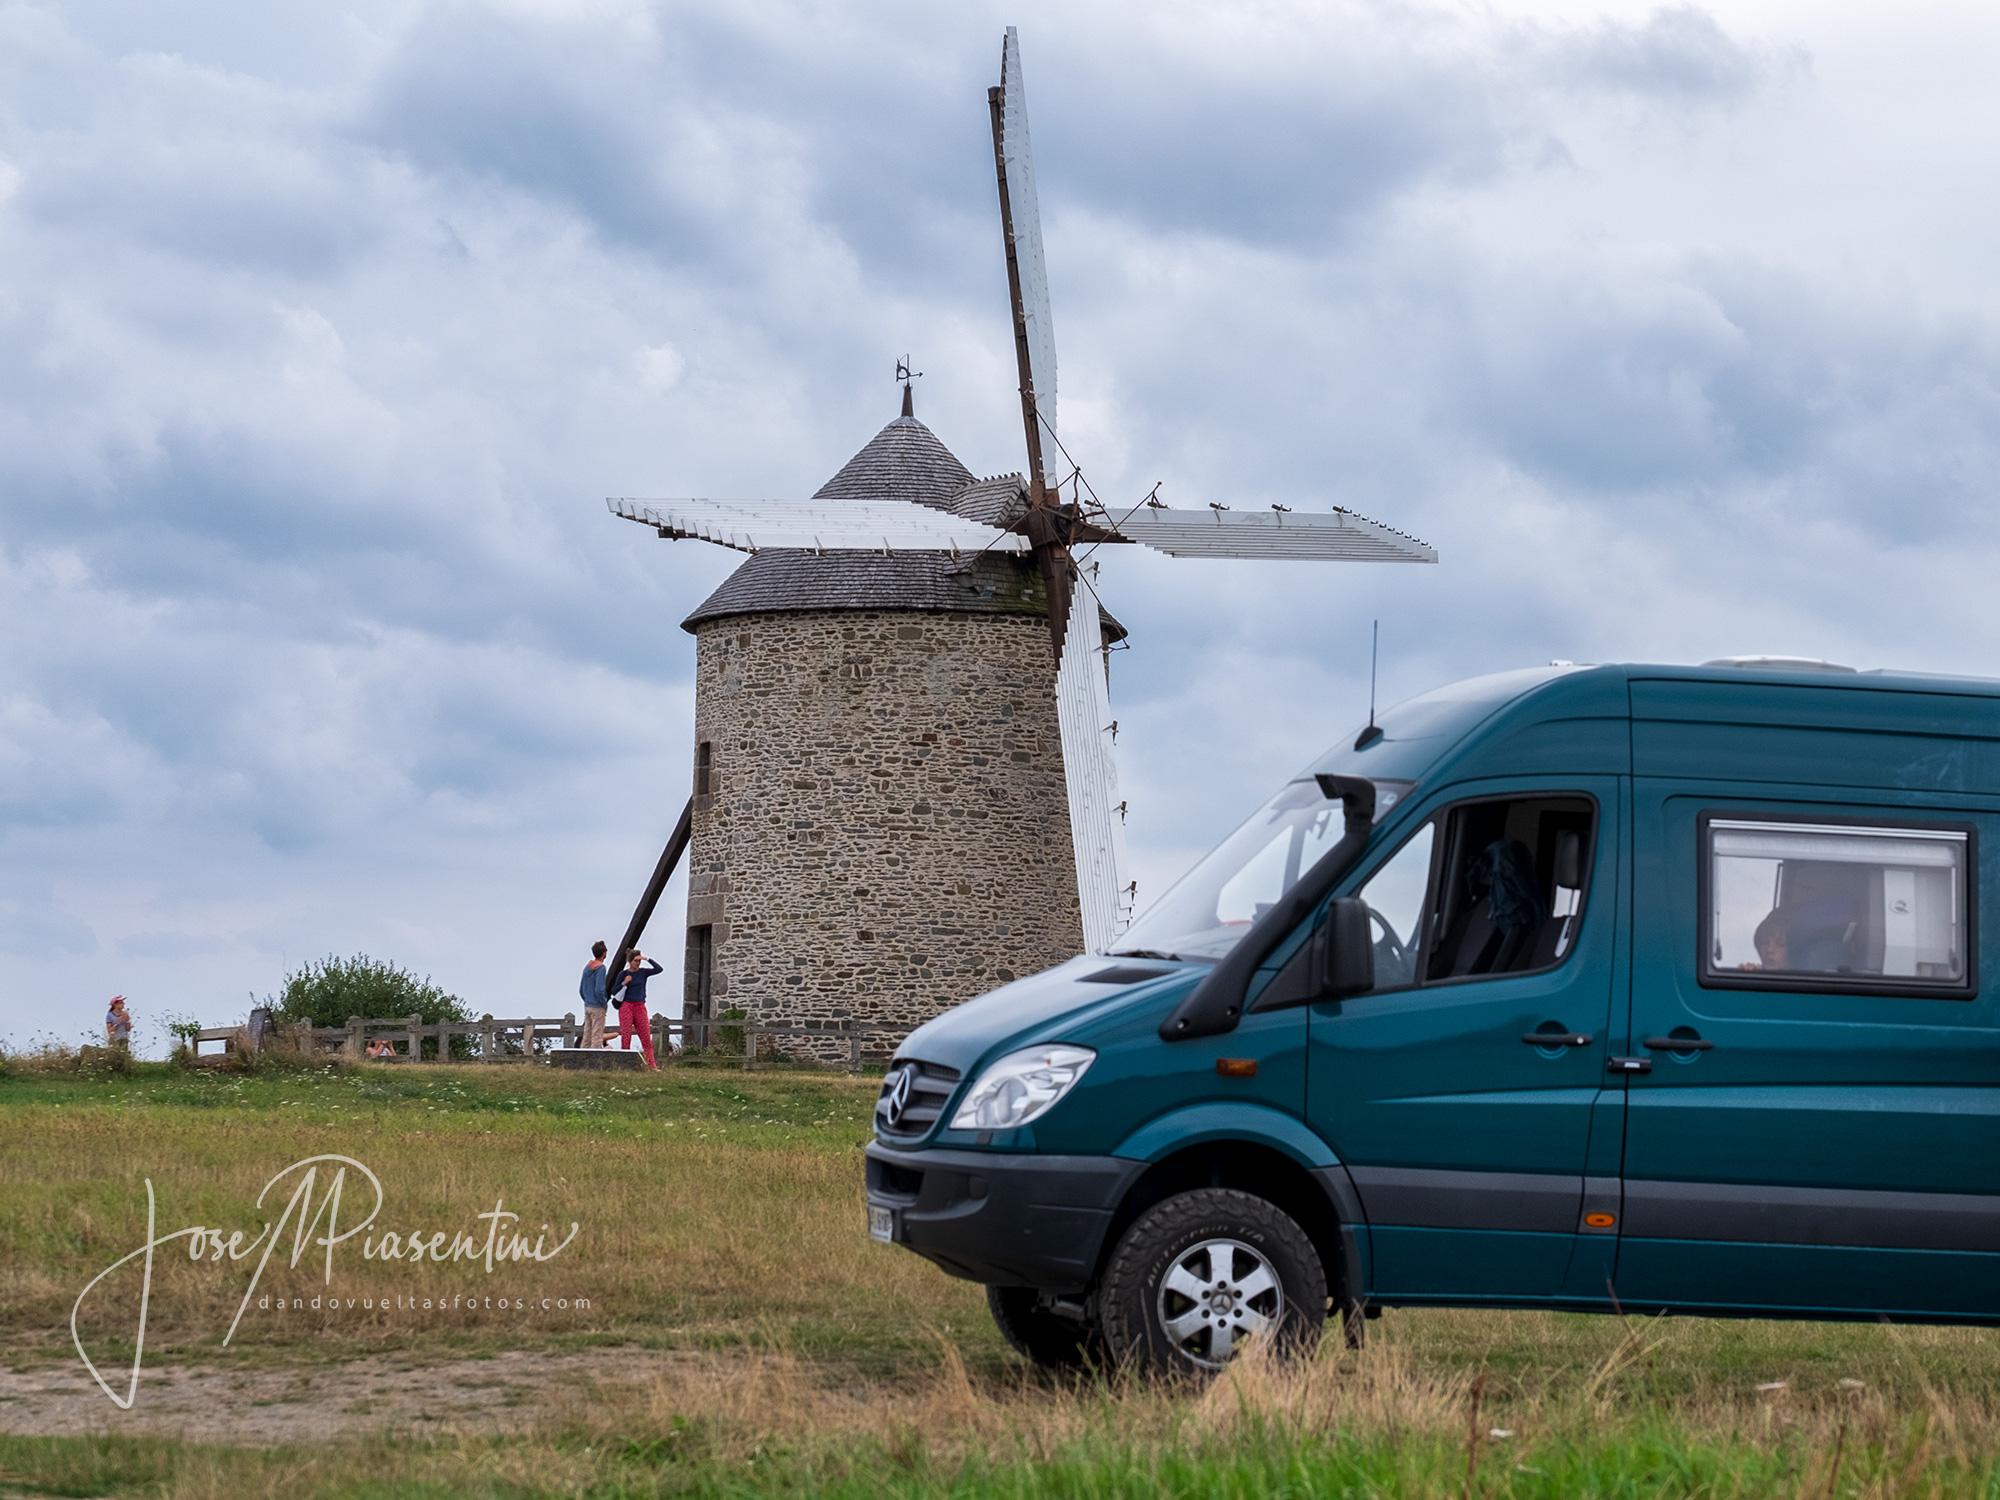 Saint Michel en furgoneta Sprinter 4x4 camper